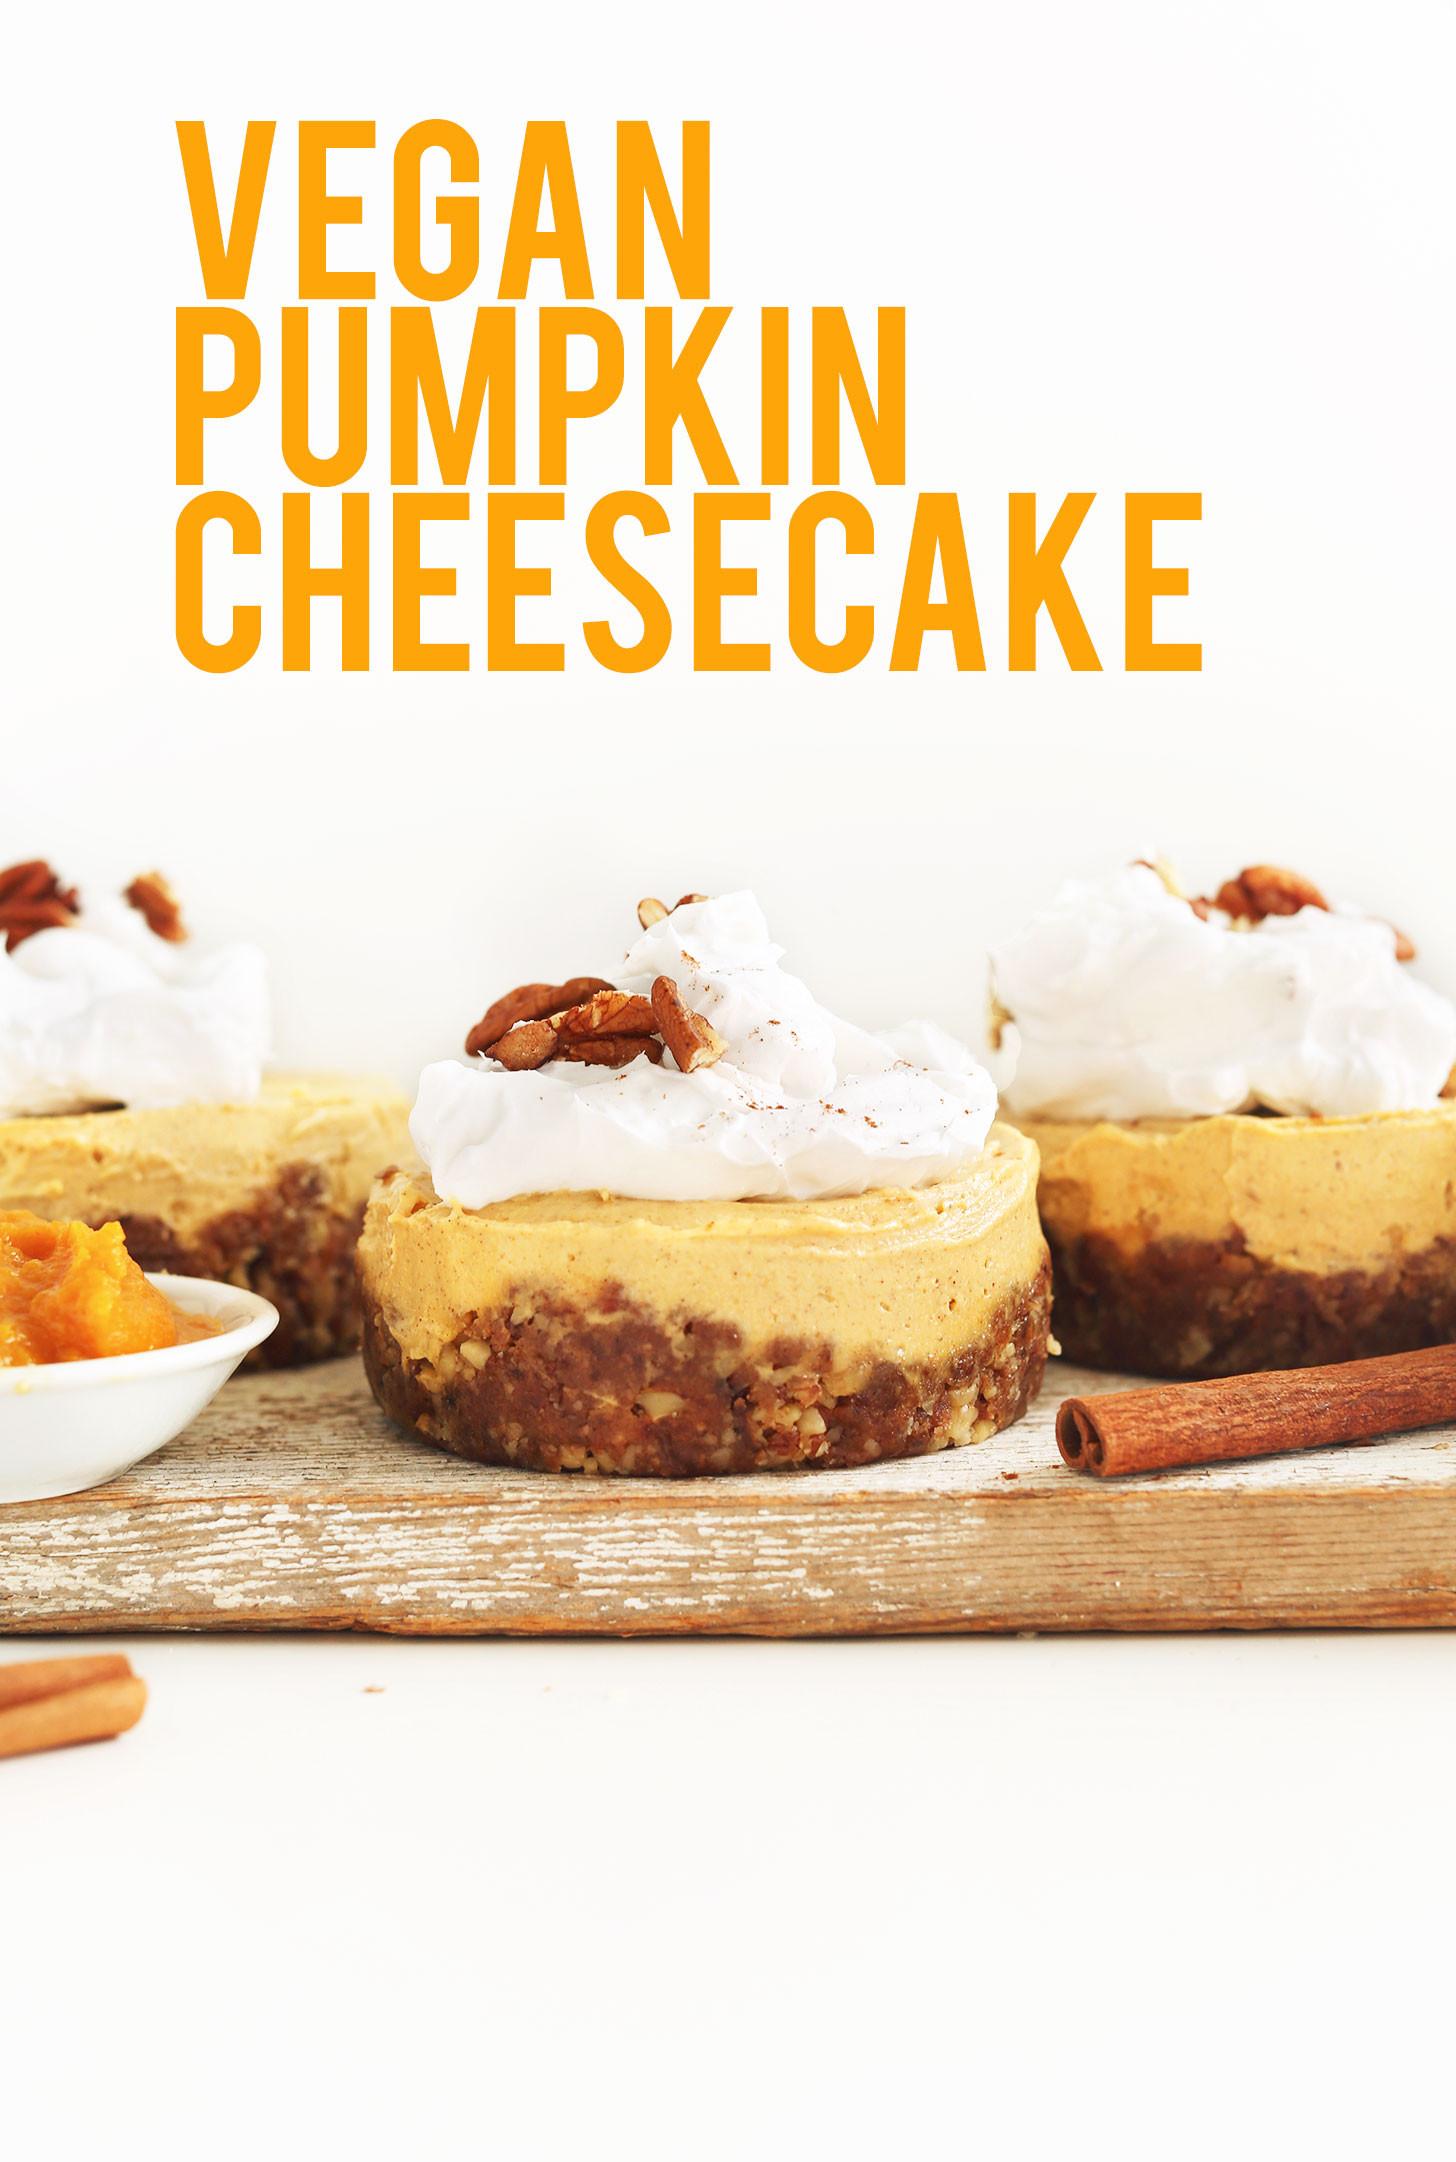 Vegan Pumpkin Desserts Recipes  Vegan Pumpkin Cheesecake